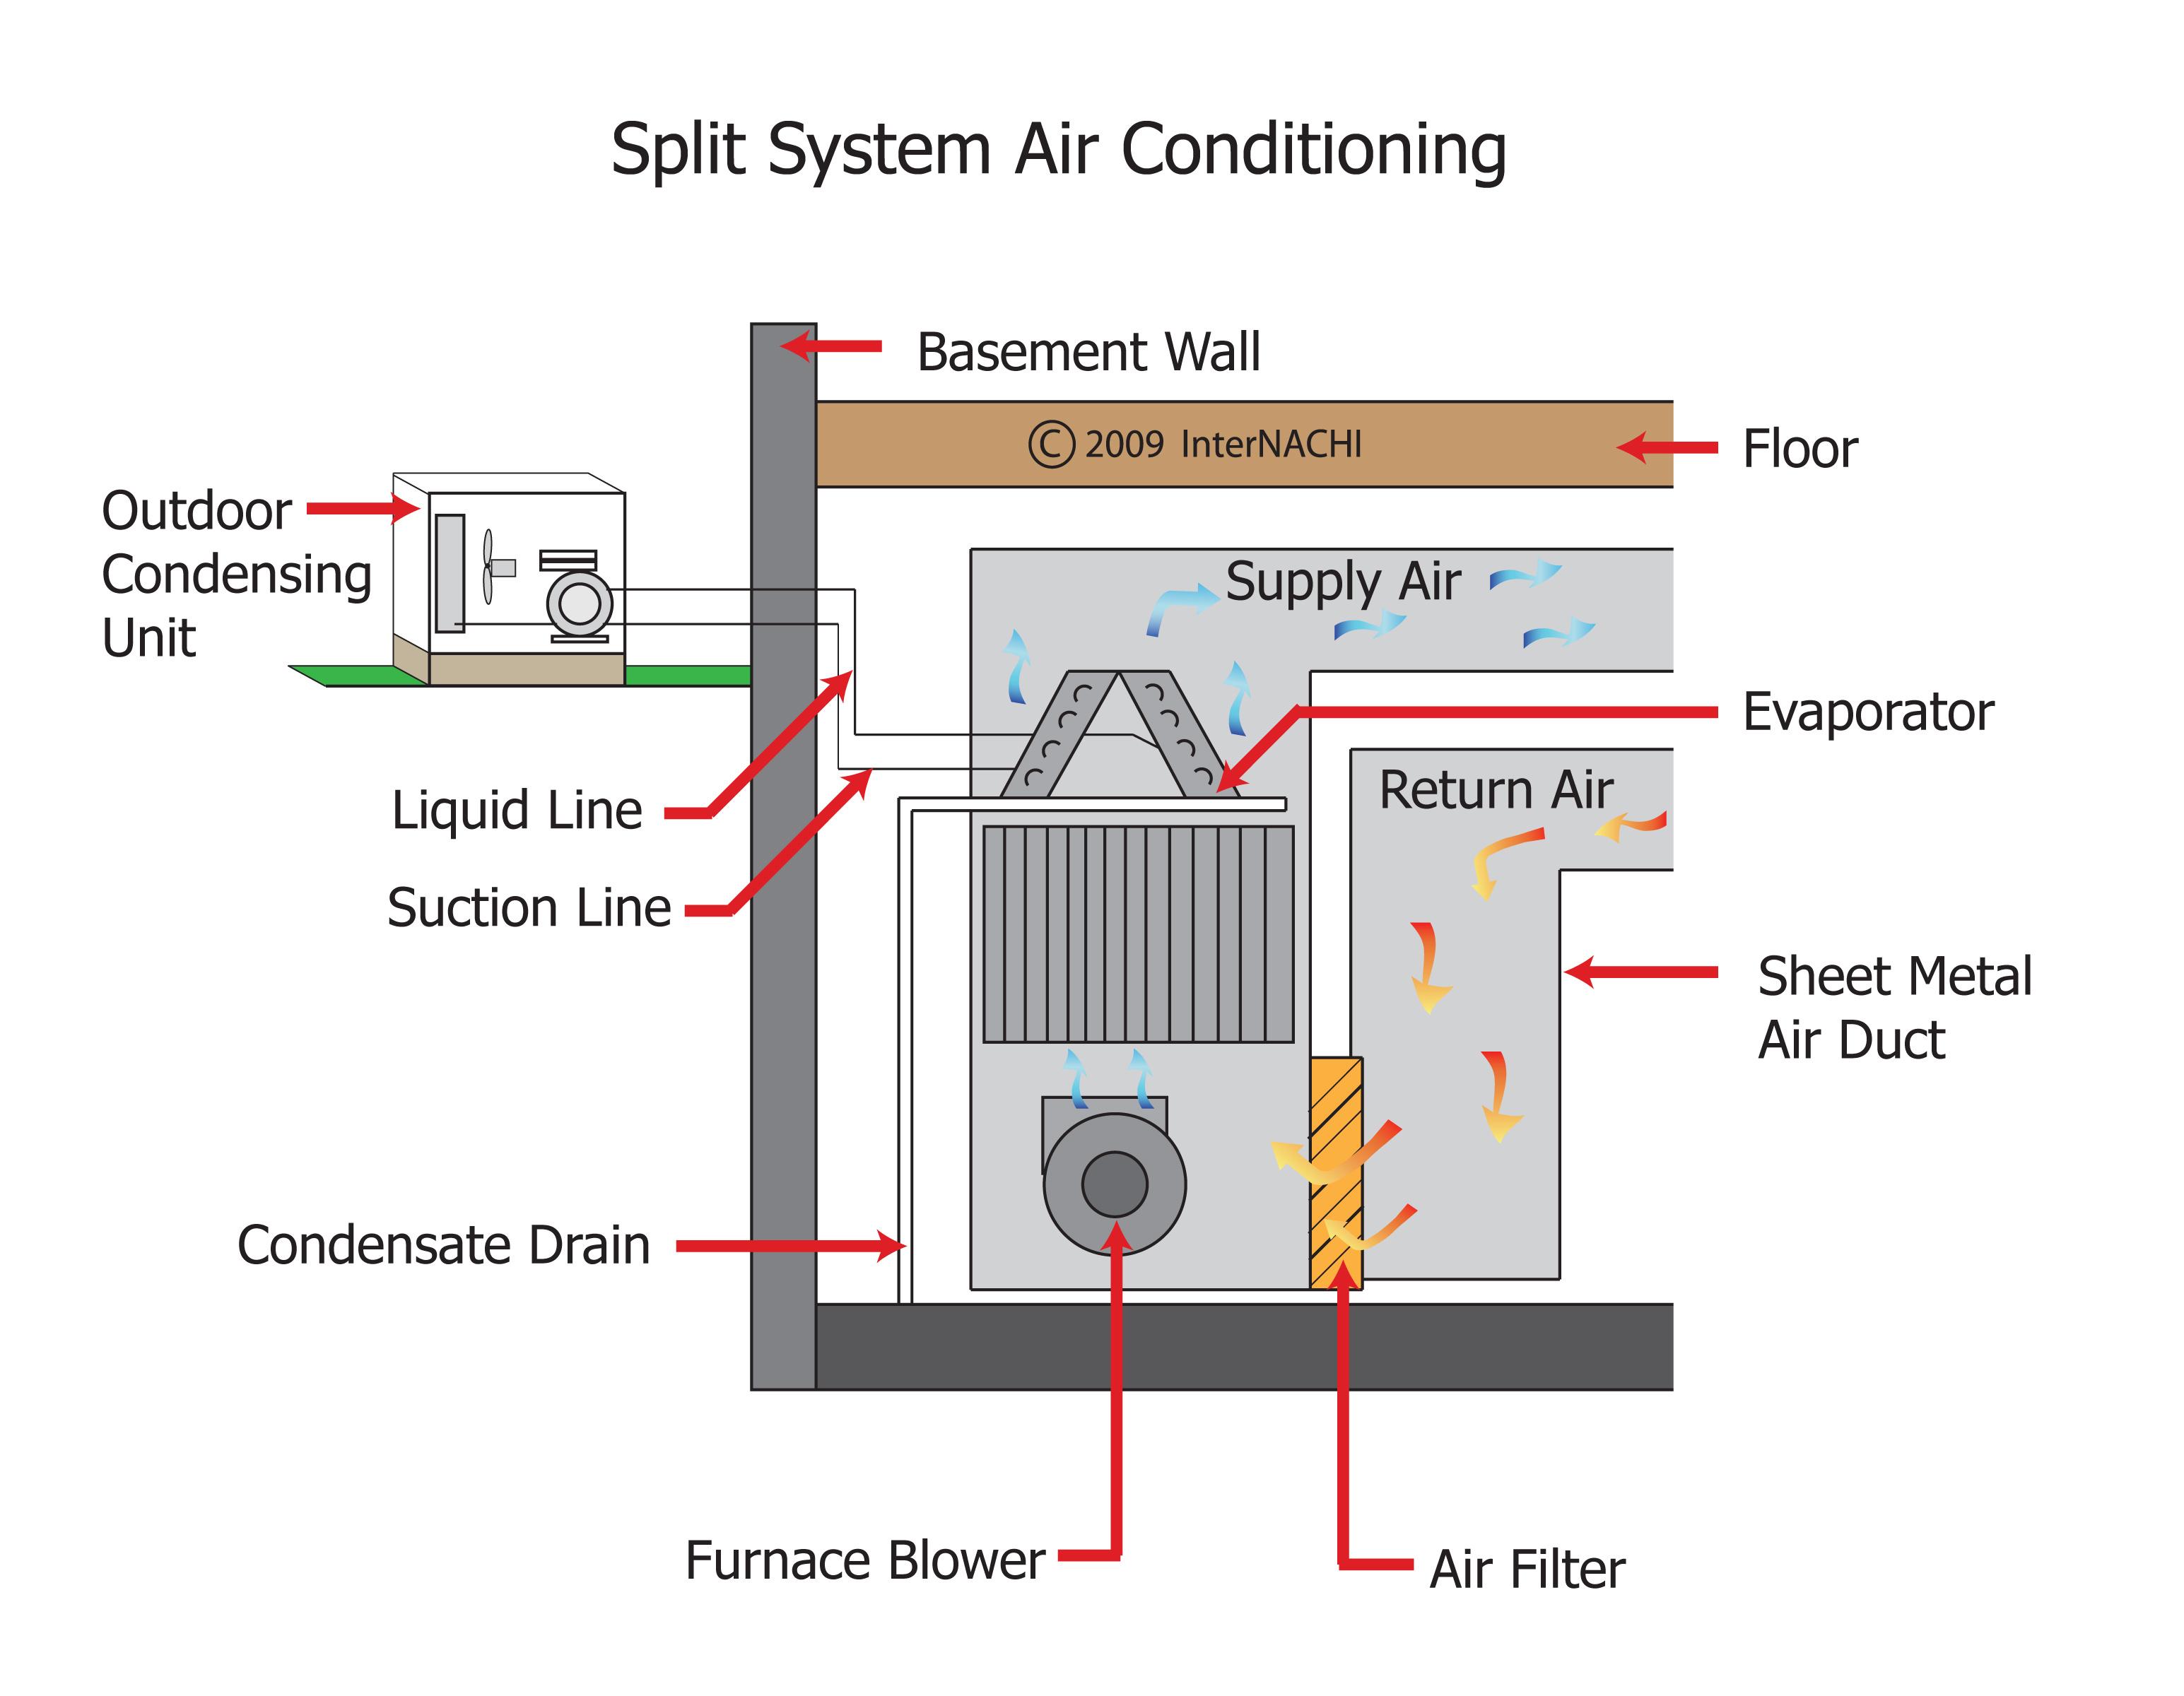 Split system air conditioning.